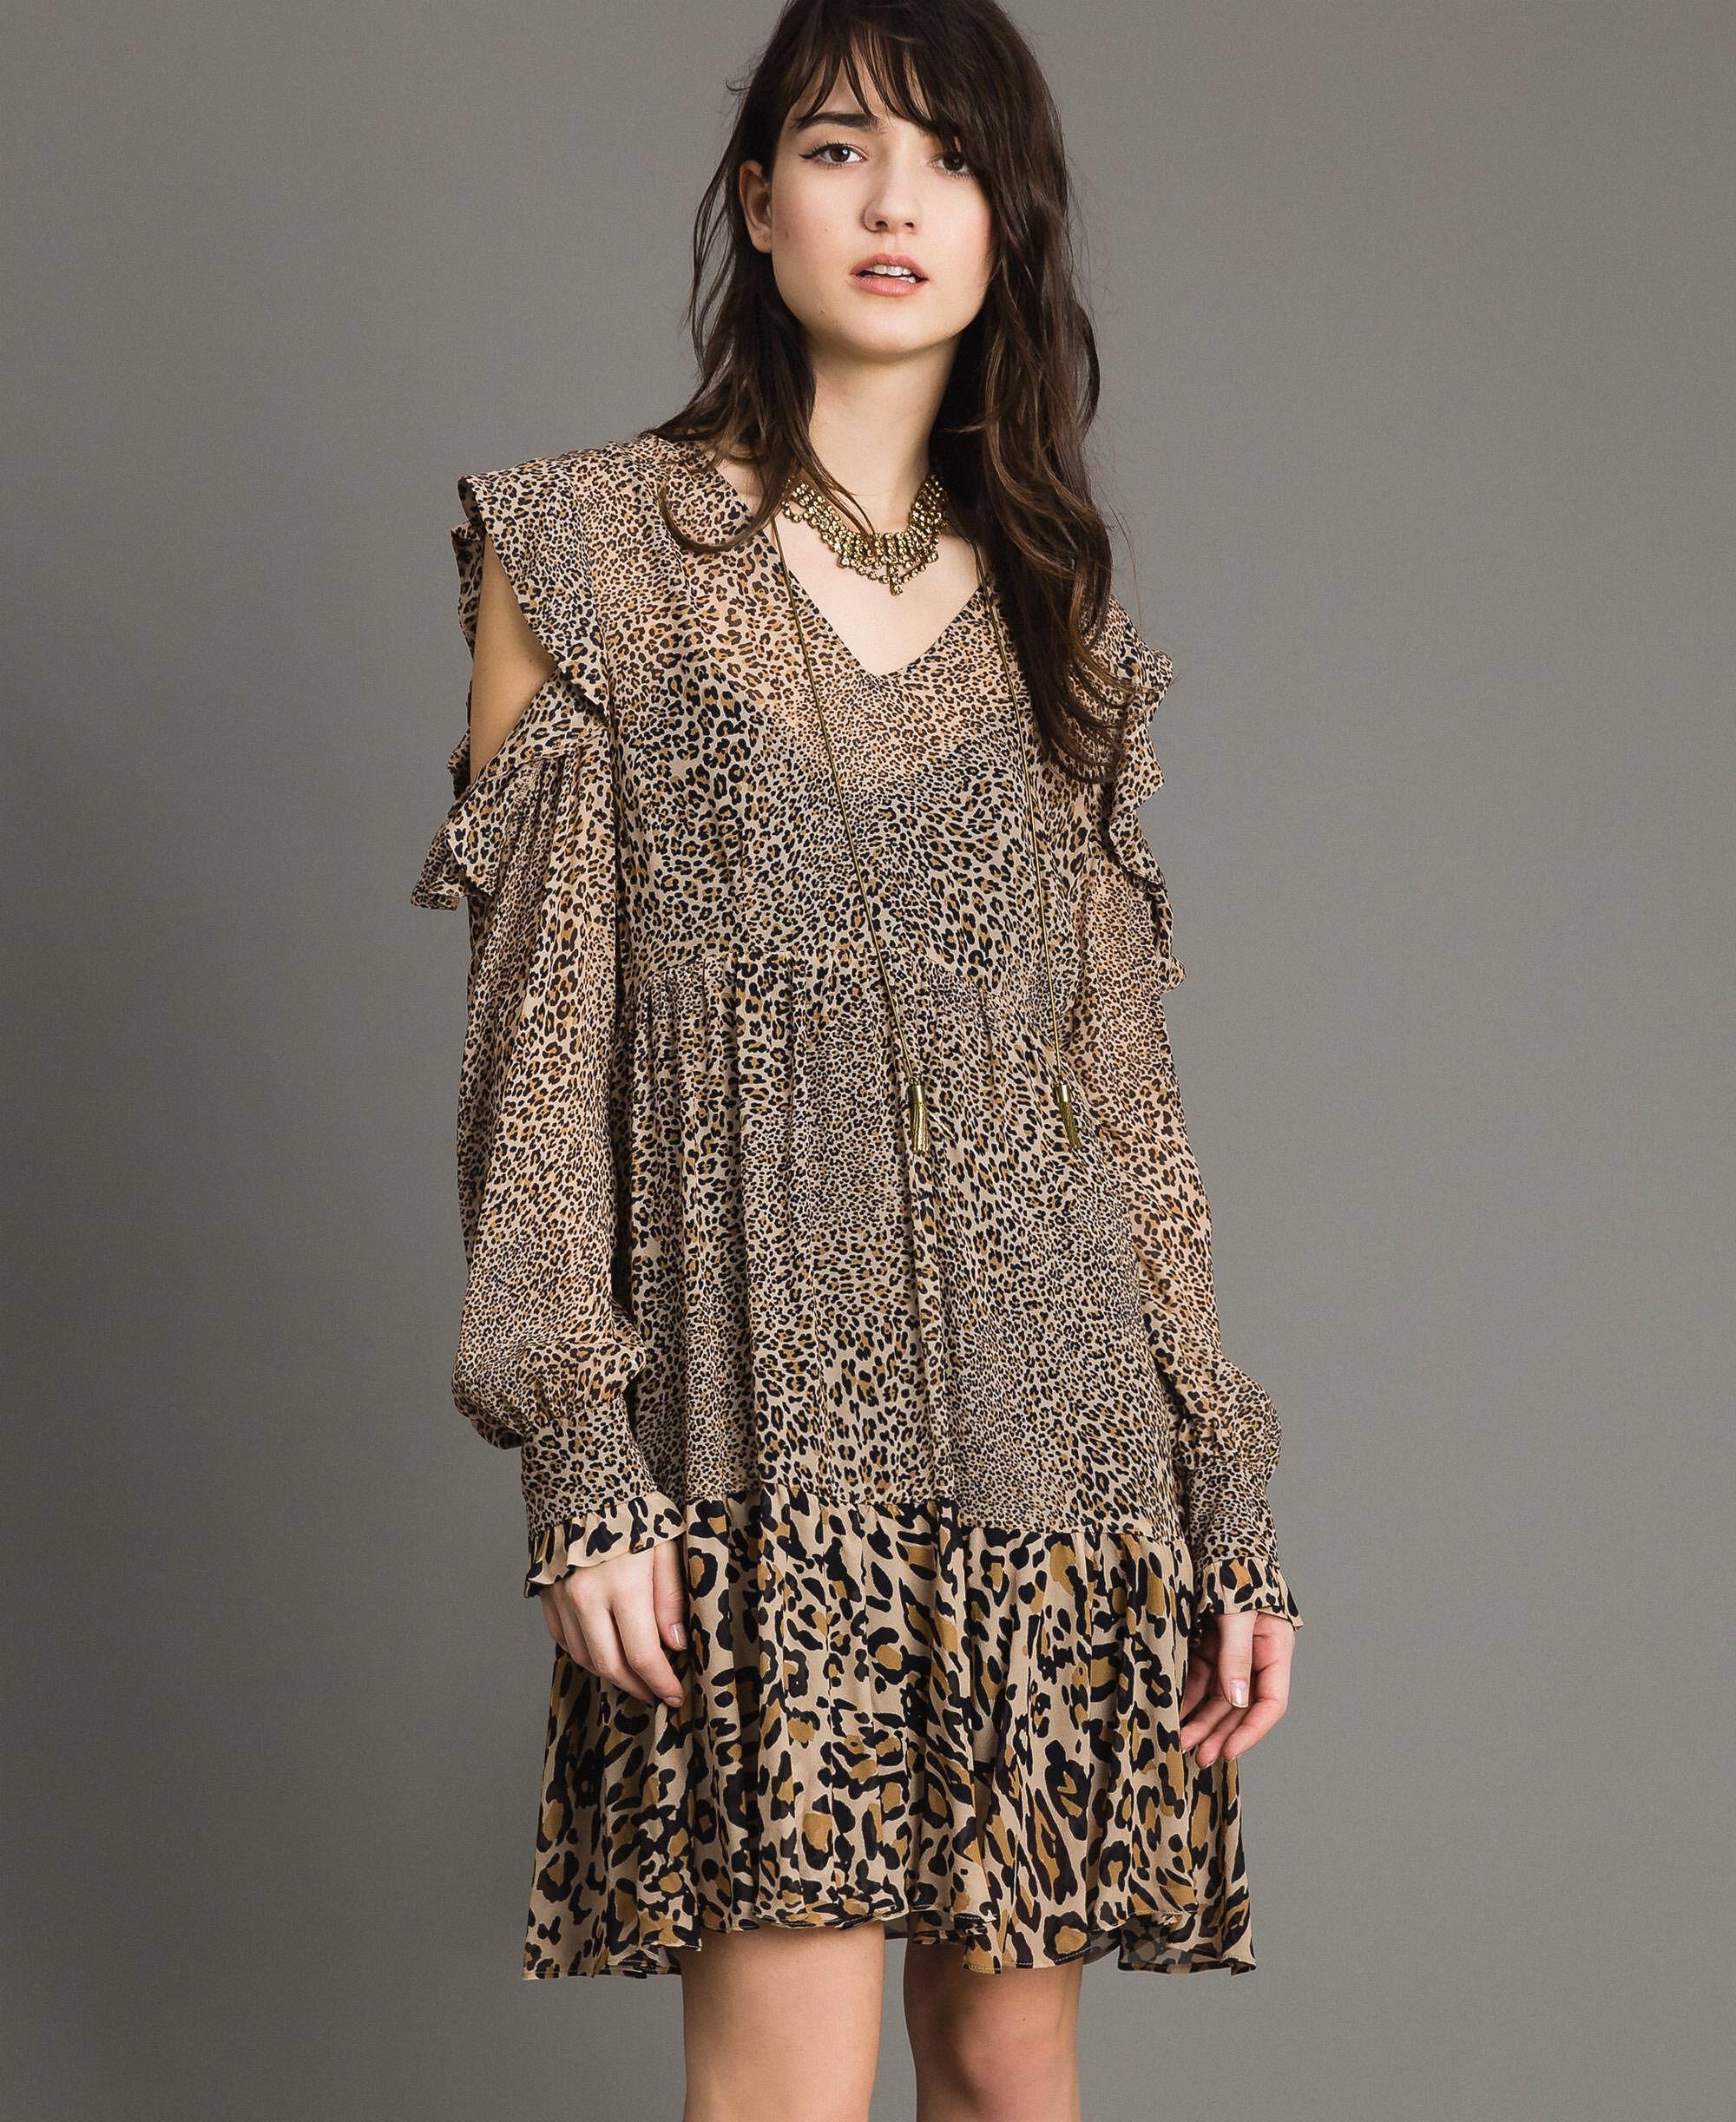 Animal Girl Dress